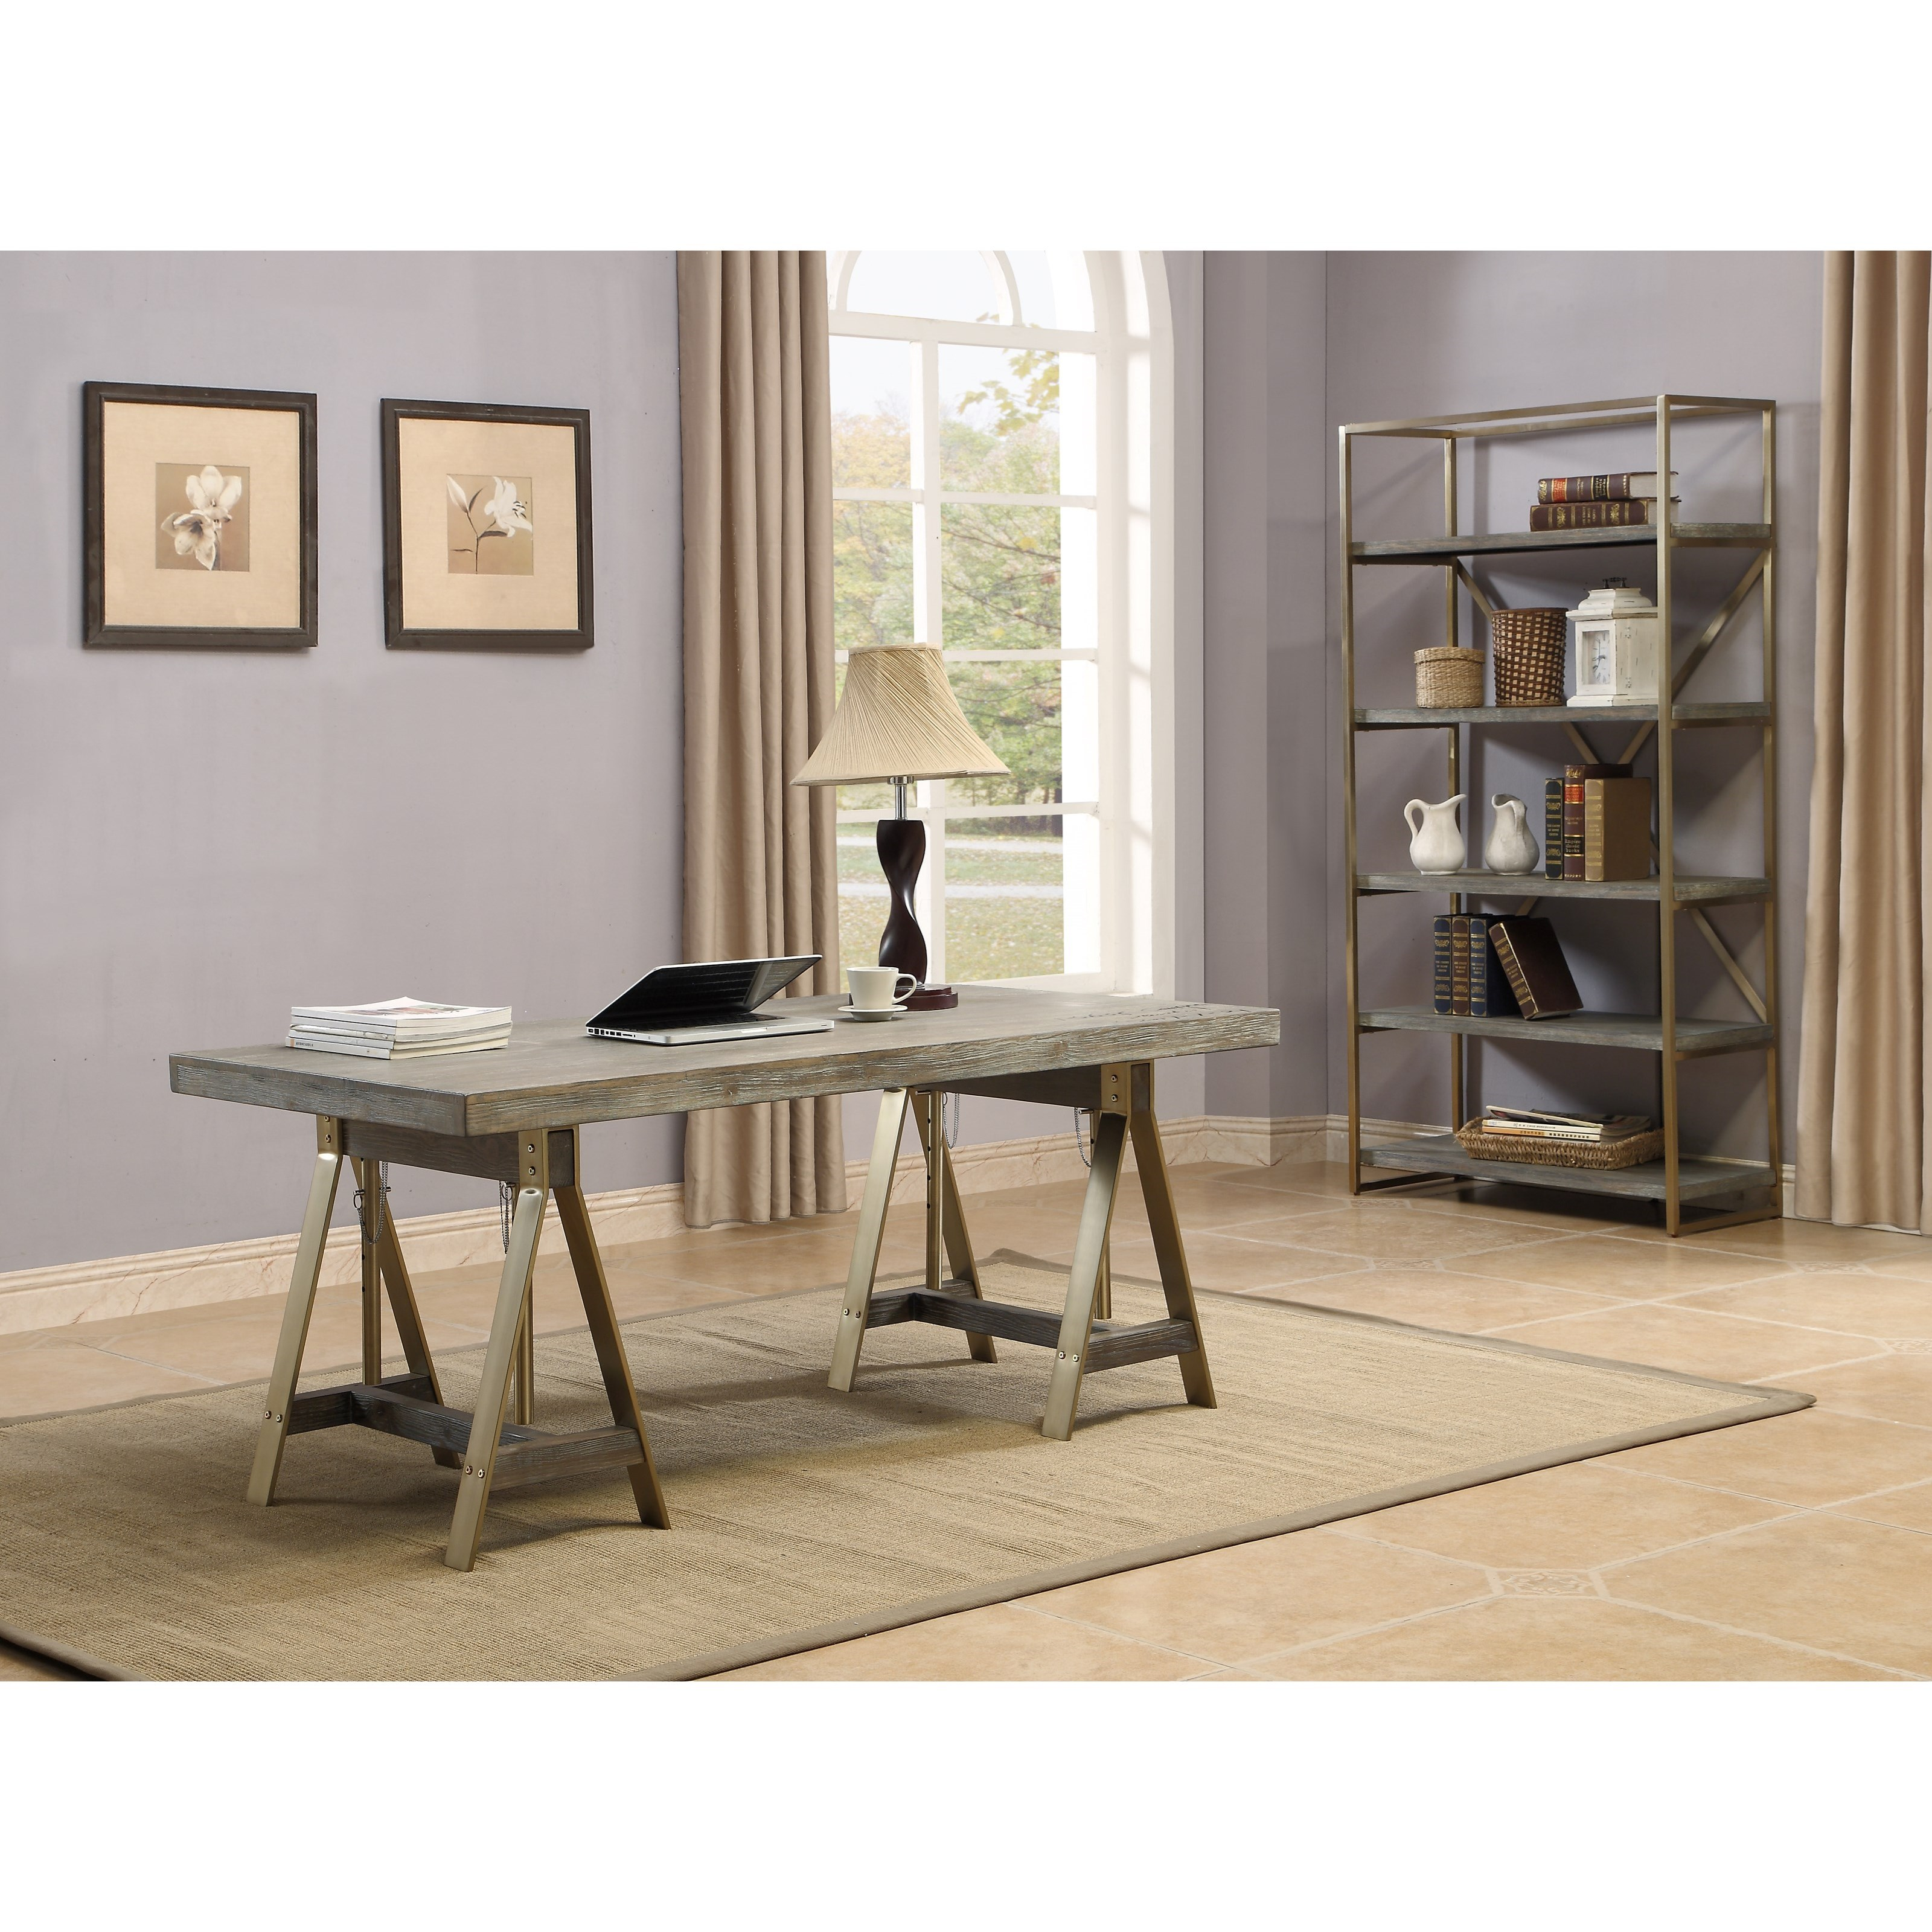 adjustable dining table   desk adjustable dining table   desk by coast to coast imports   wolf      rh   wolffurniture com